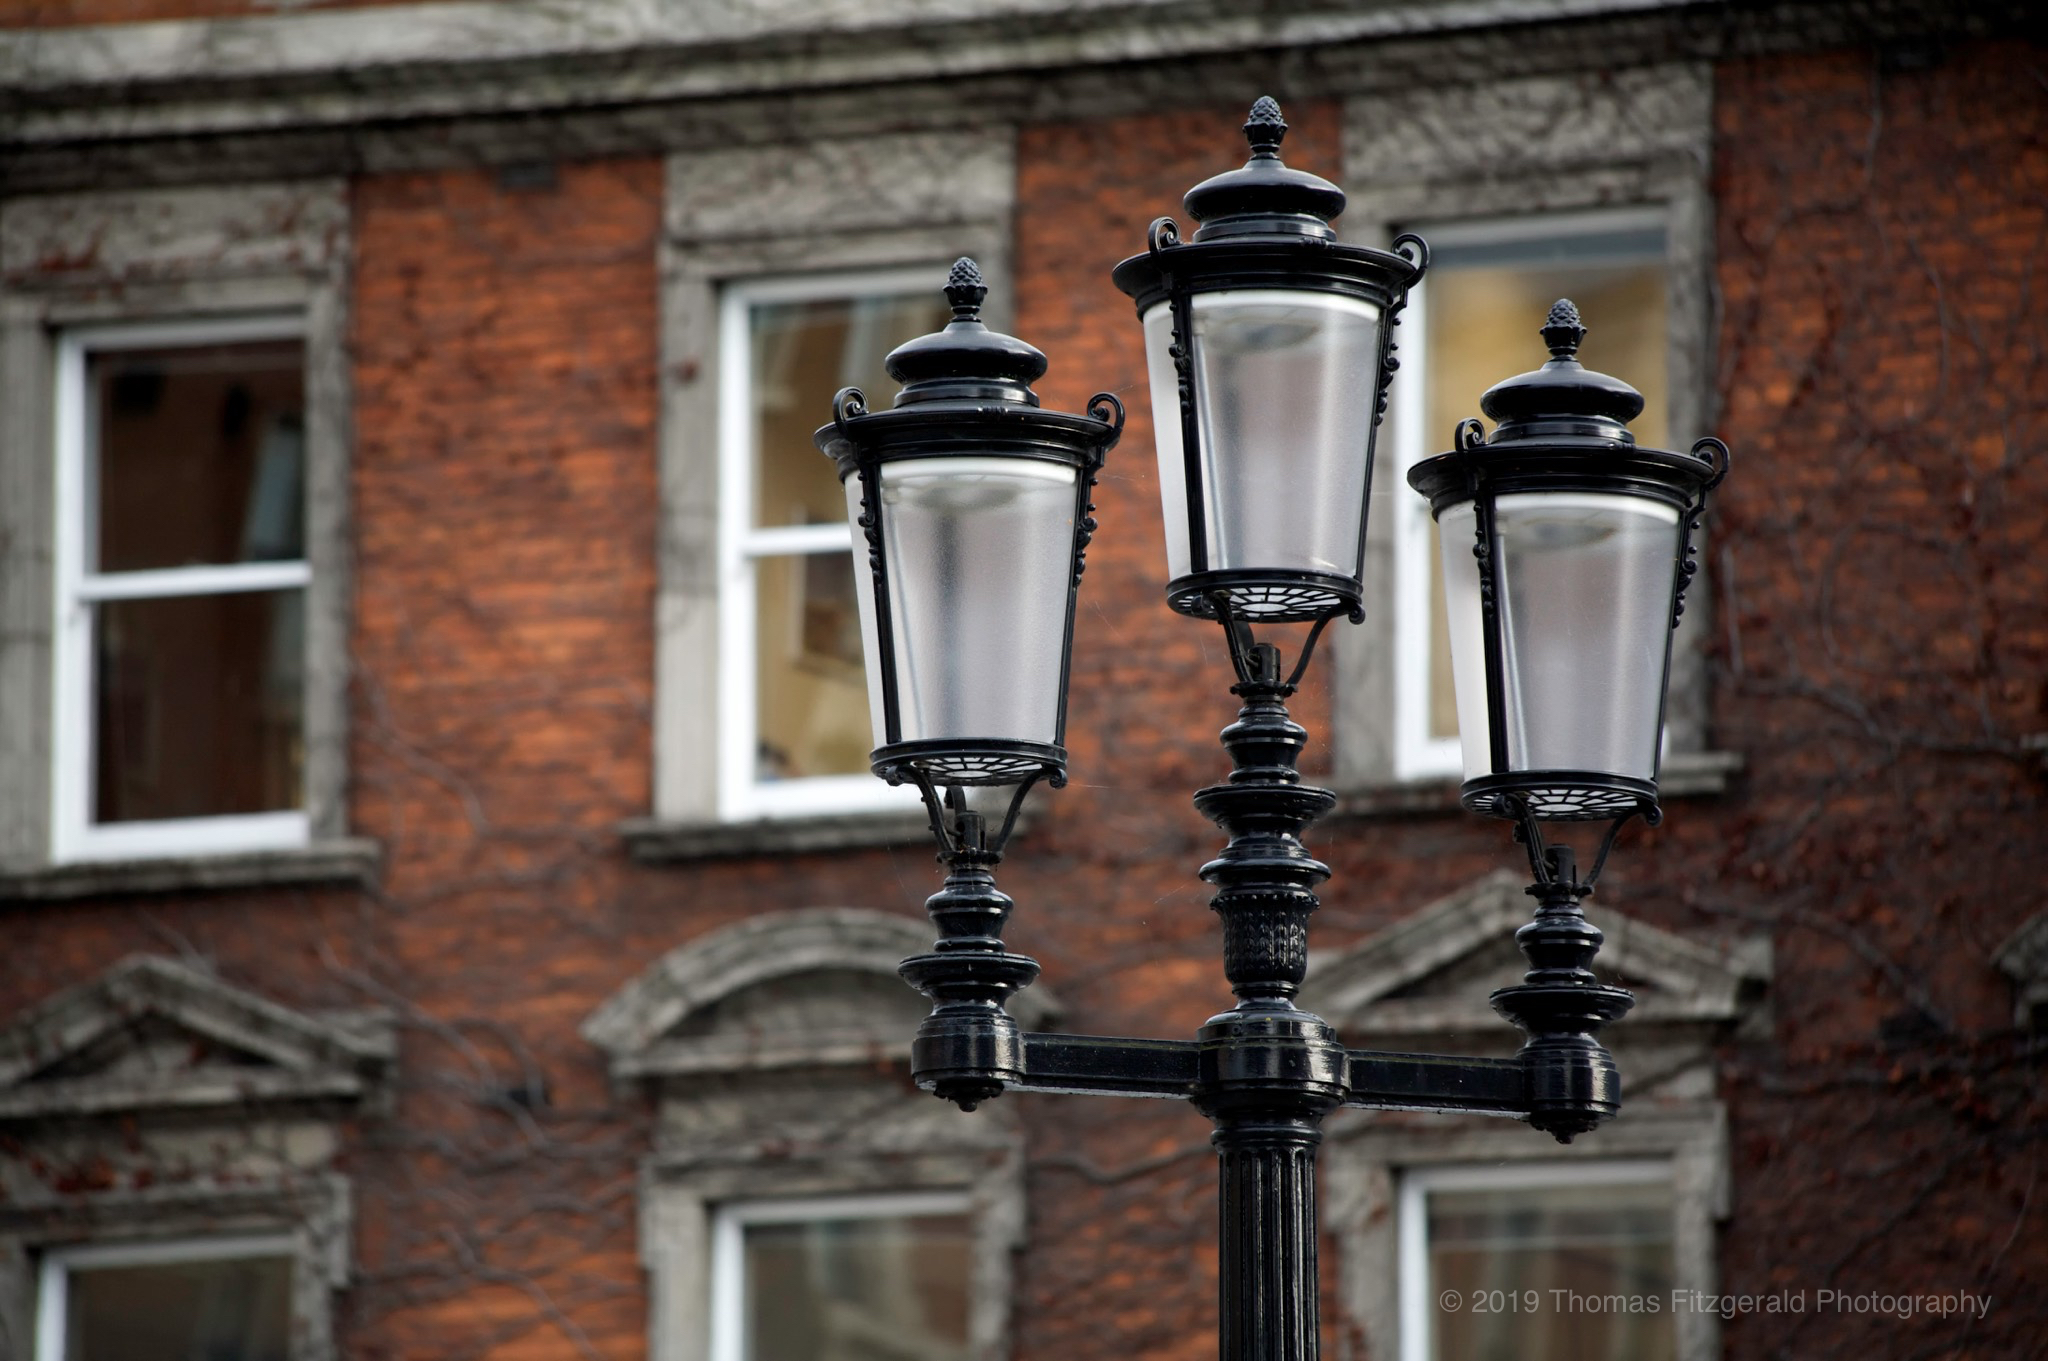 Lamp post on georgian building in Dublin